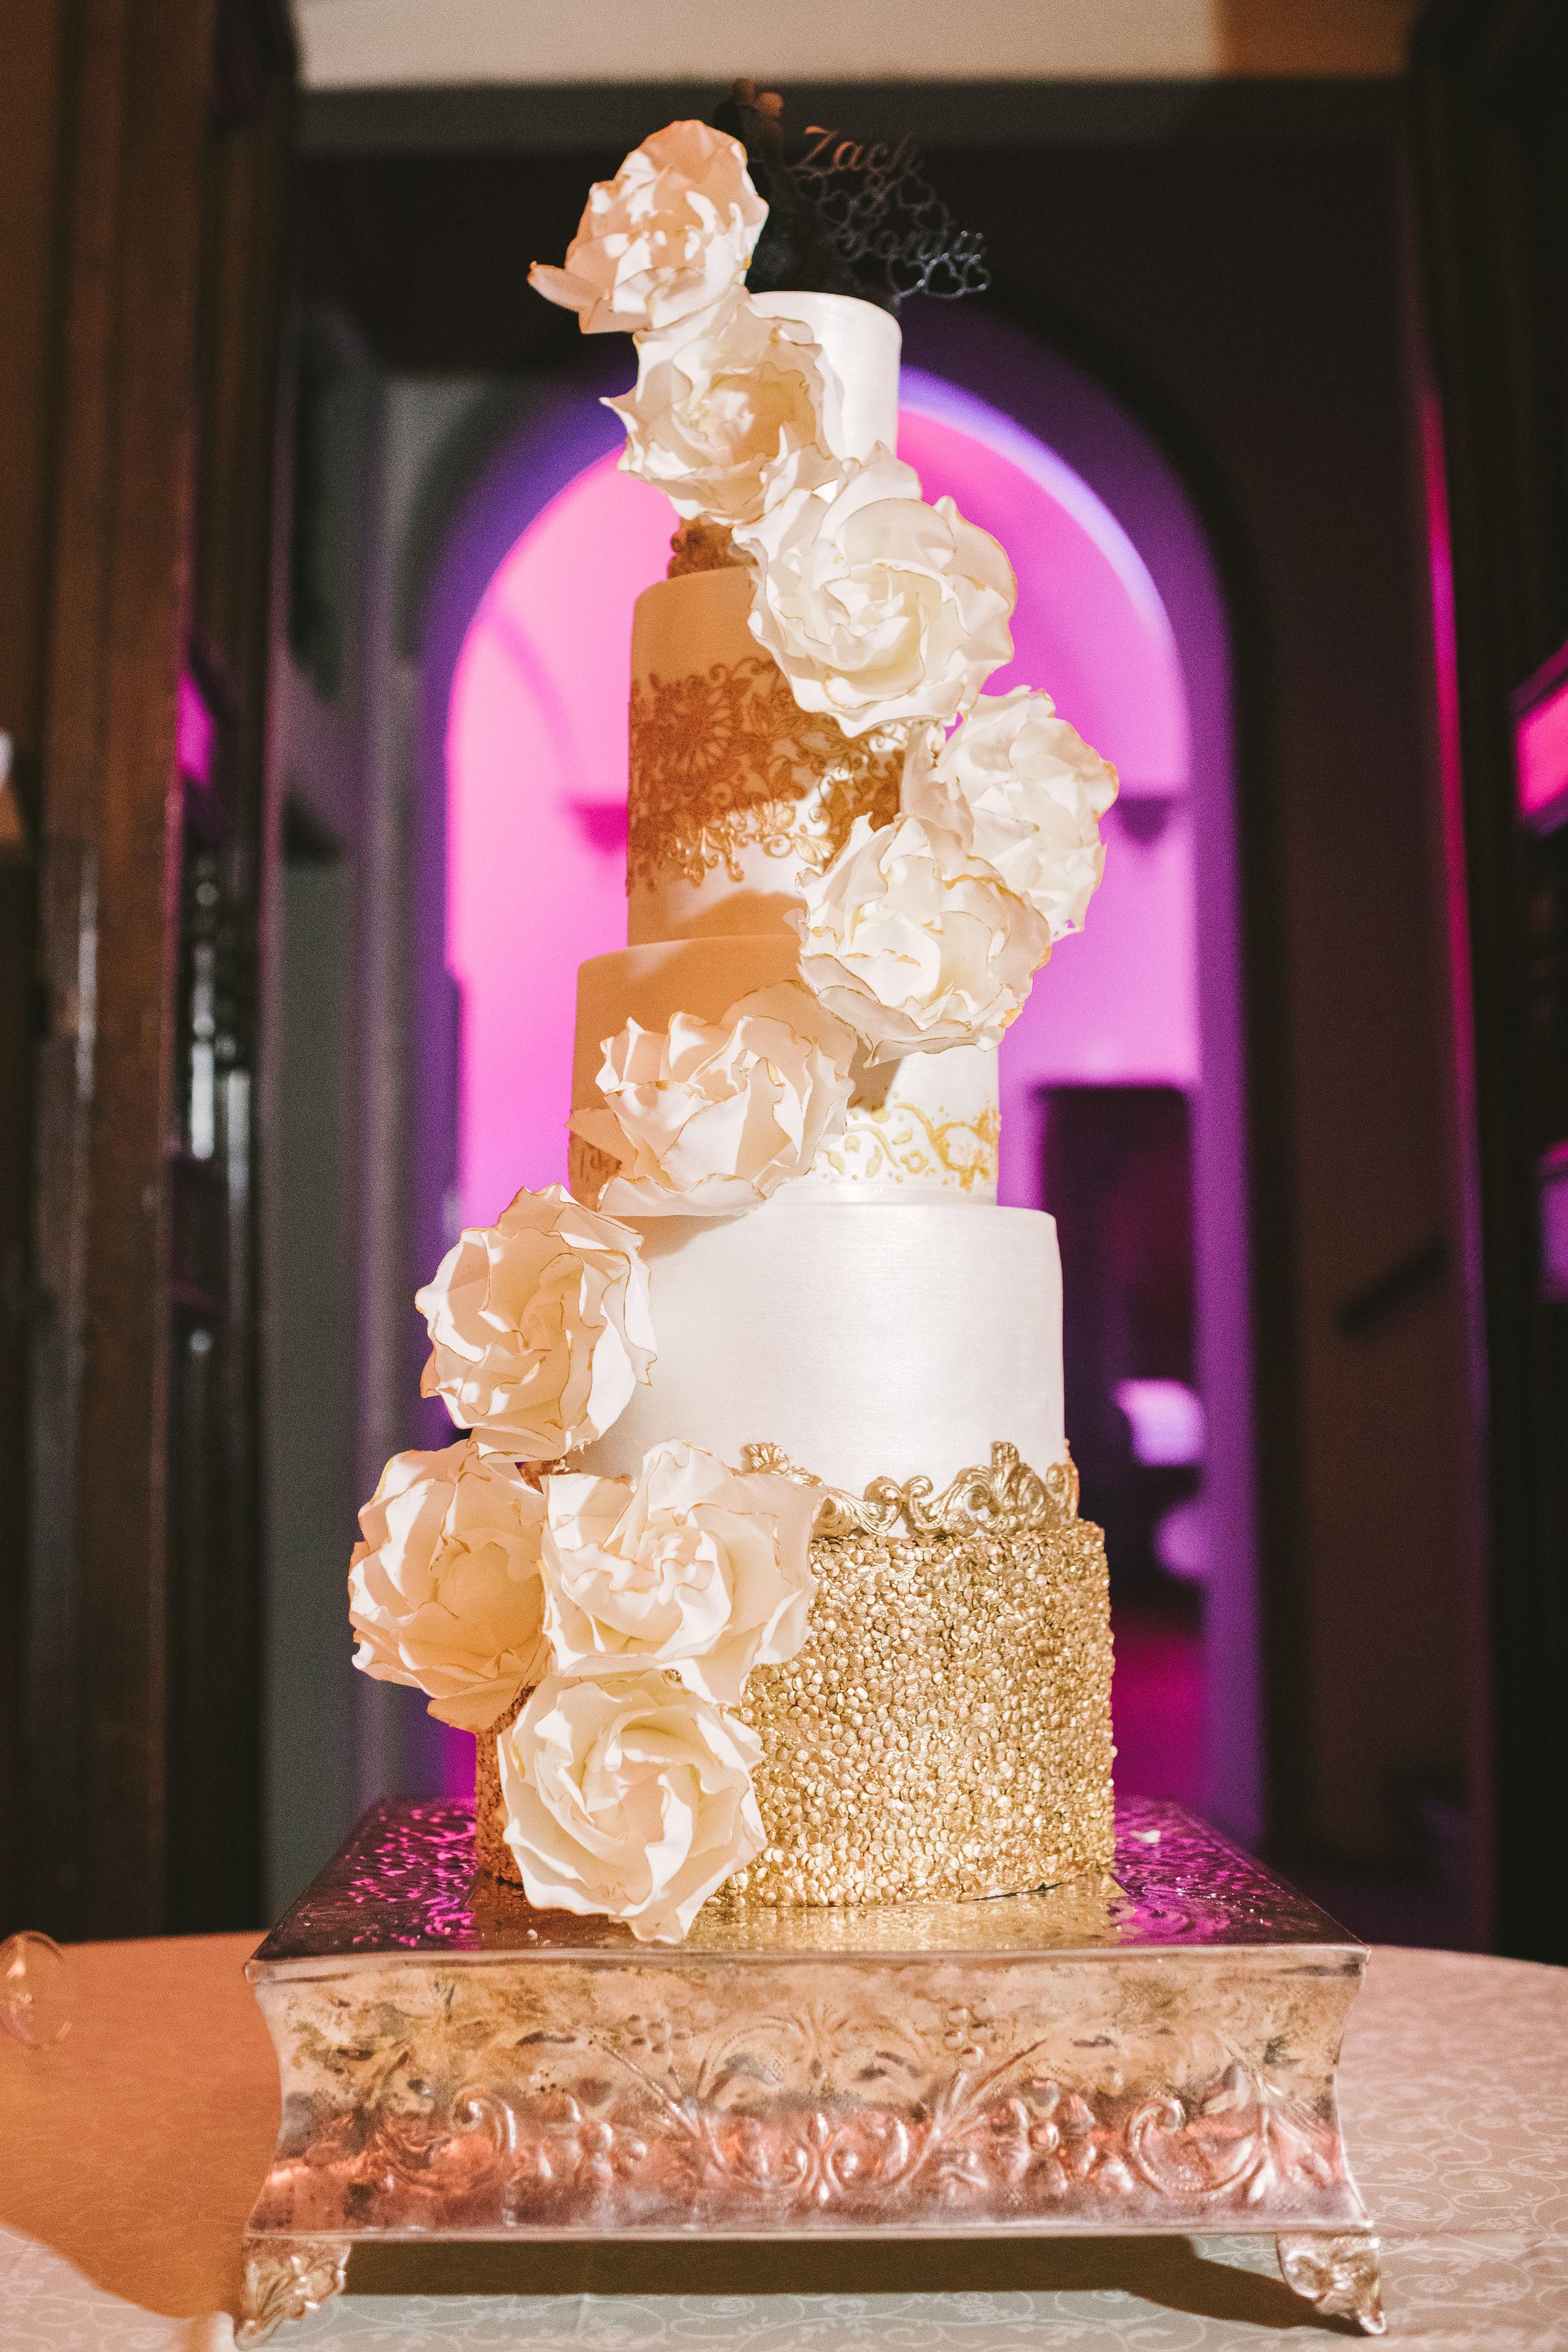 incredible_wedding_cake.jpg